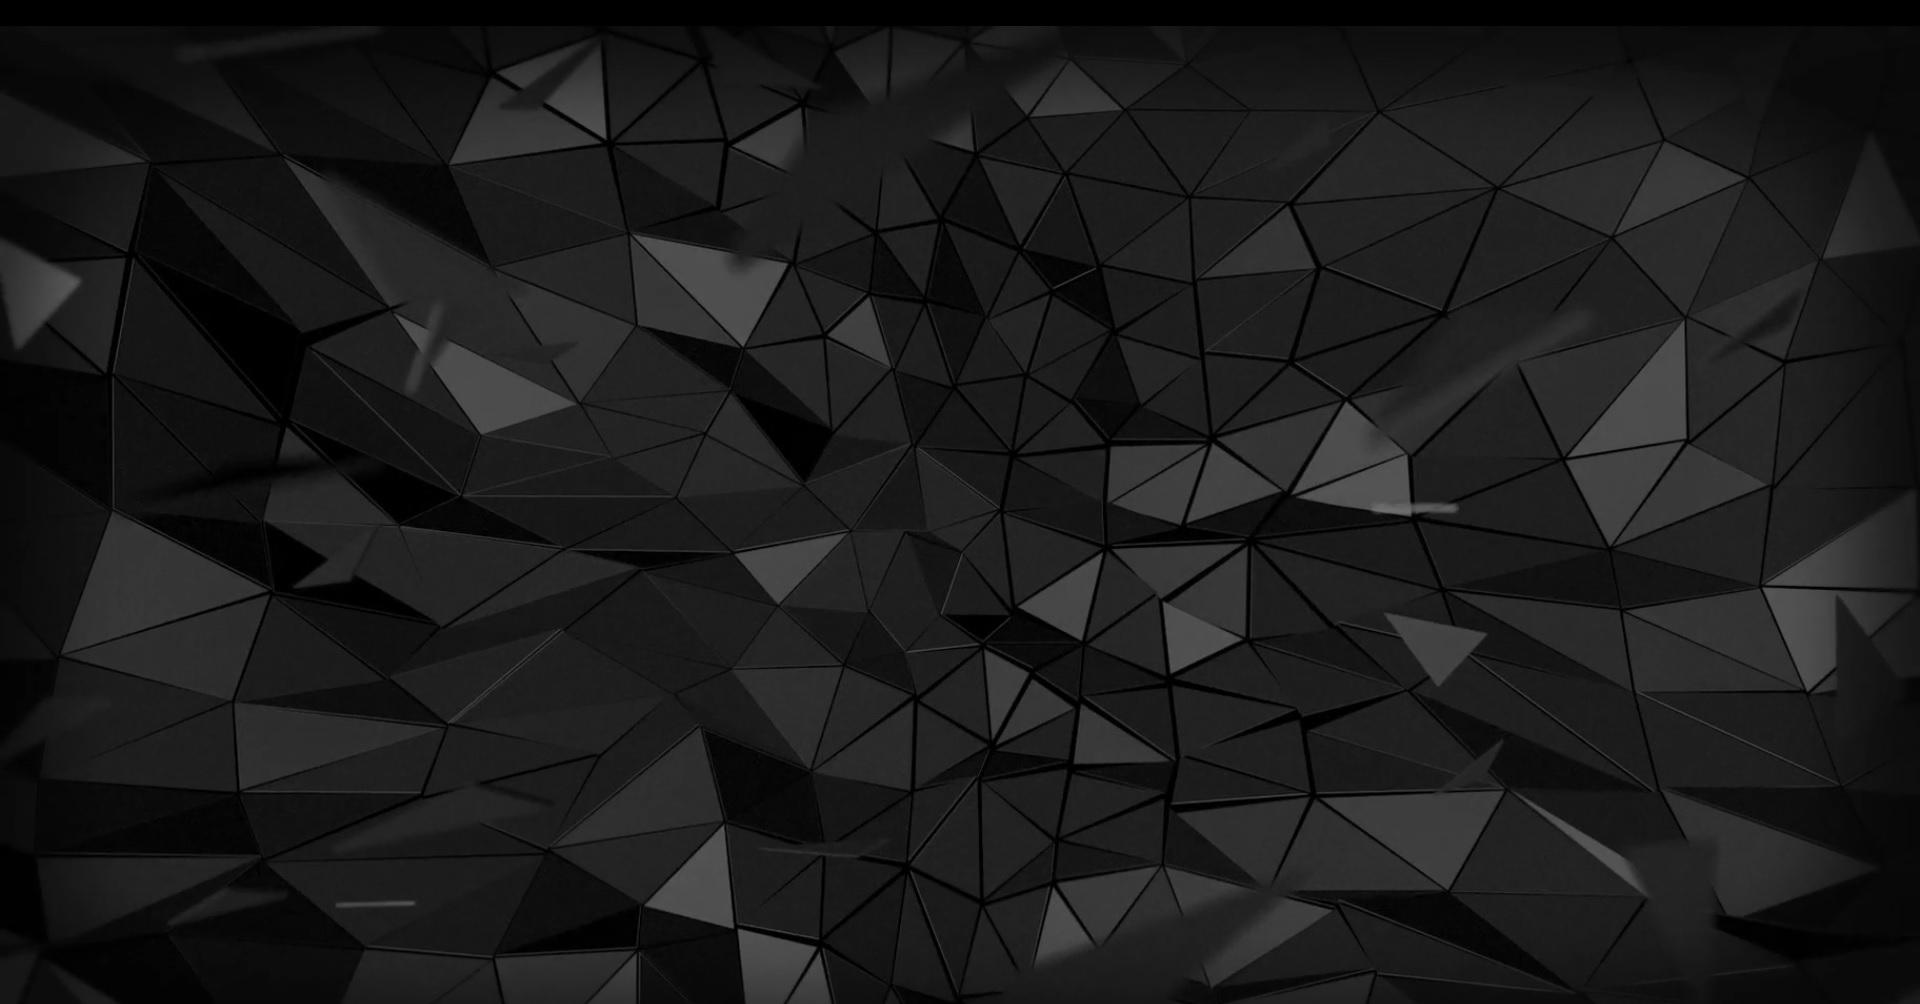 Deus Ex Mankind Divided Wallpaper: Deus Ex:MD, Abstract Wallpaper By Limb0ist On DeviantArt